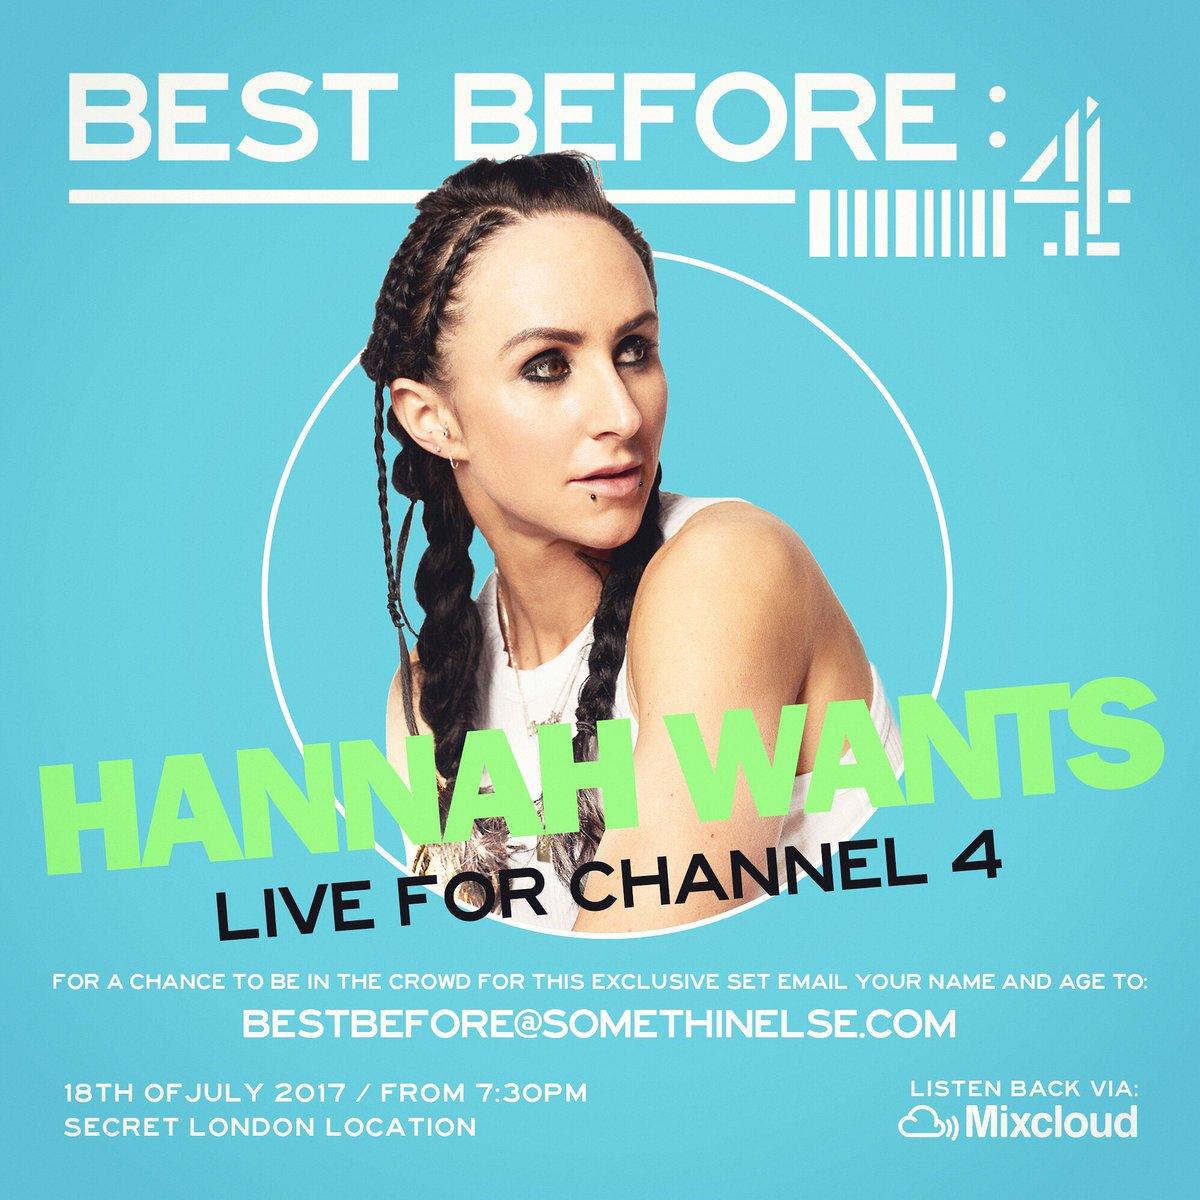 Hannah Wants on Twitter: